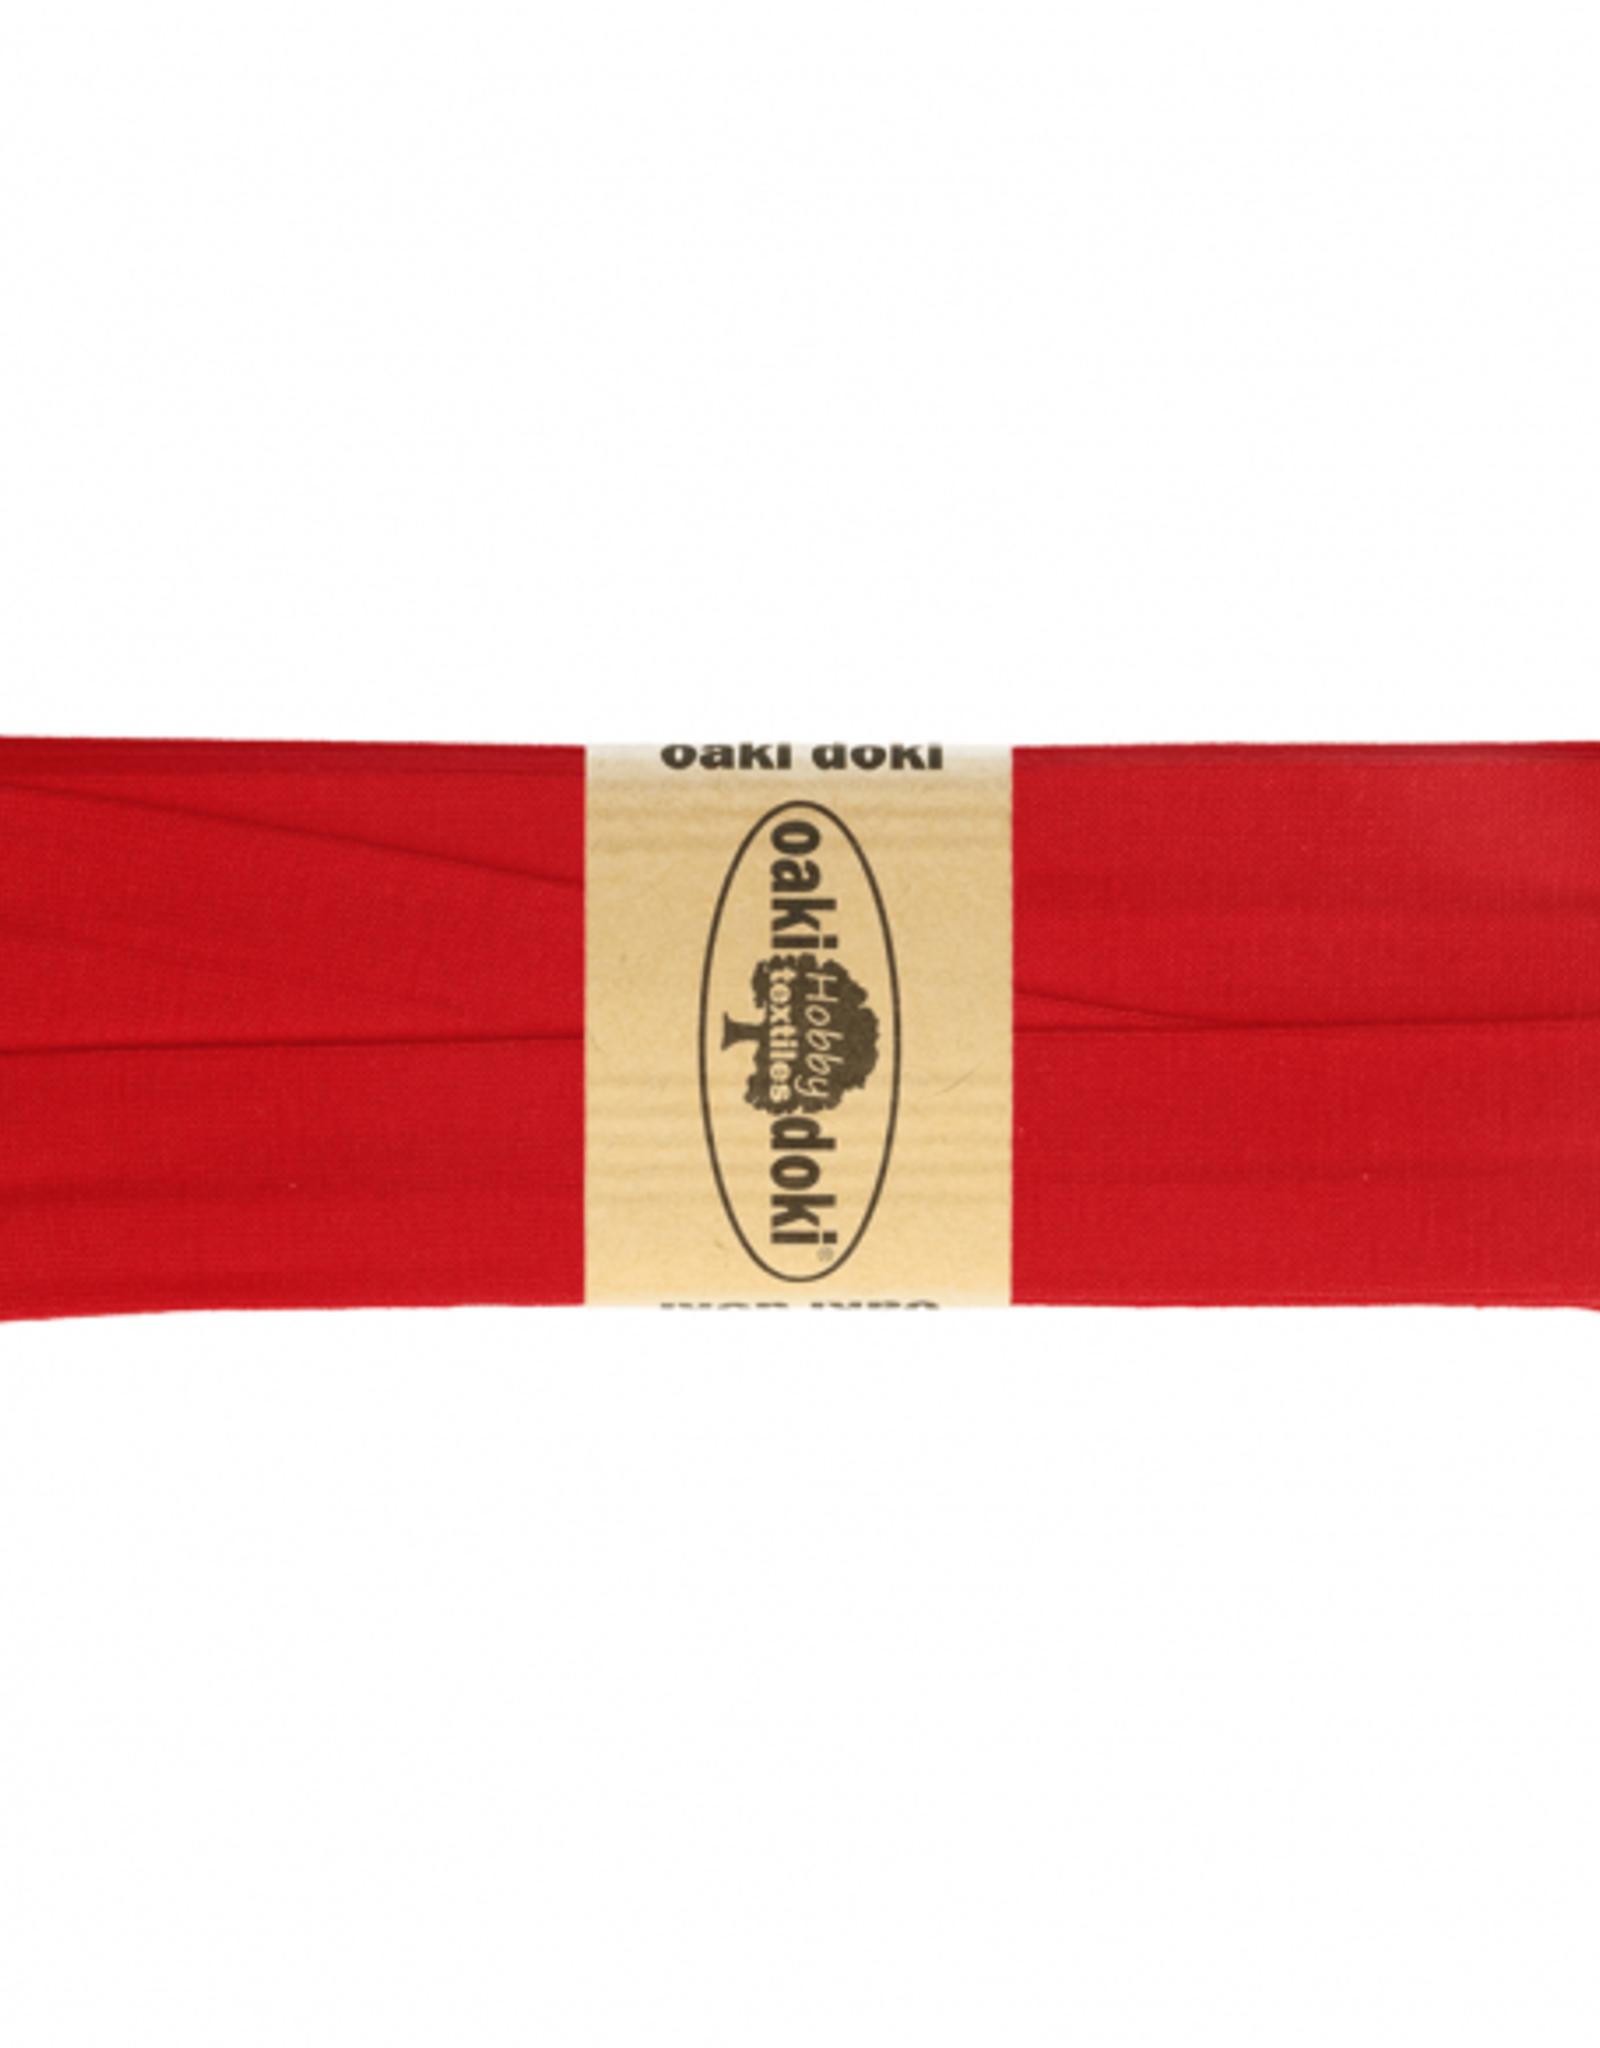 Oaki Doki Tricot de luxe jersey biaisband 20mm x 3m 620